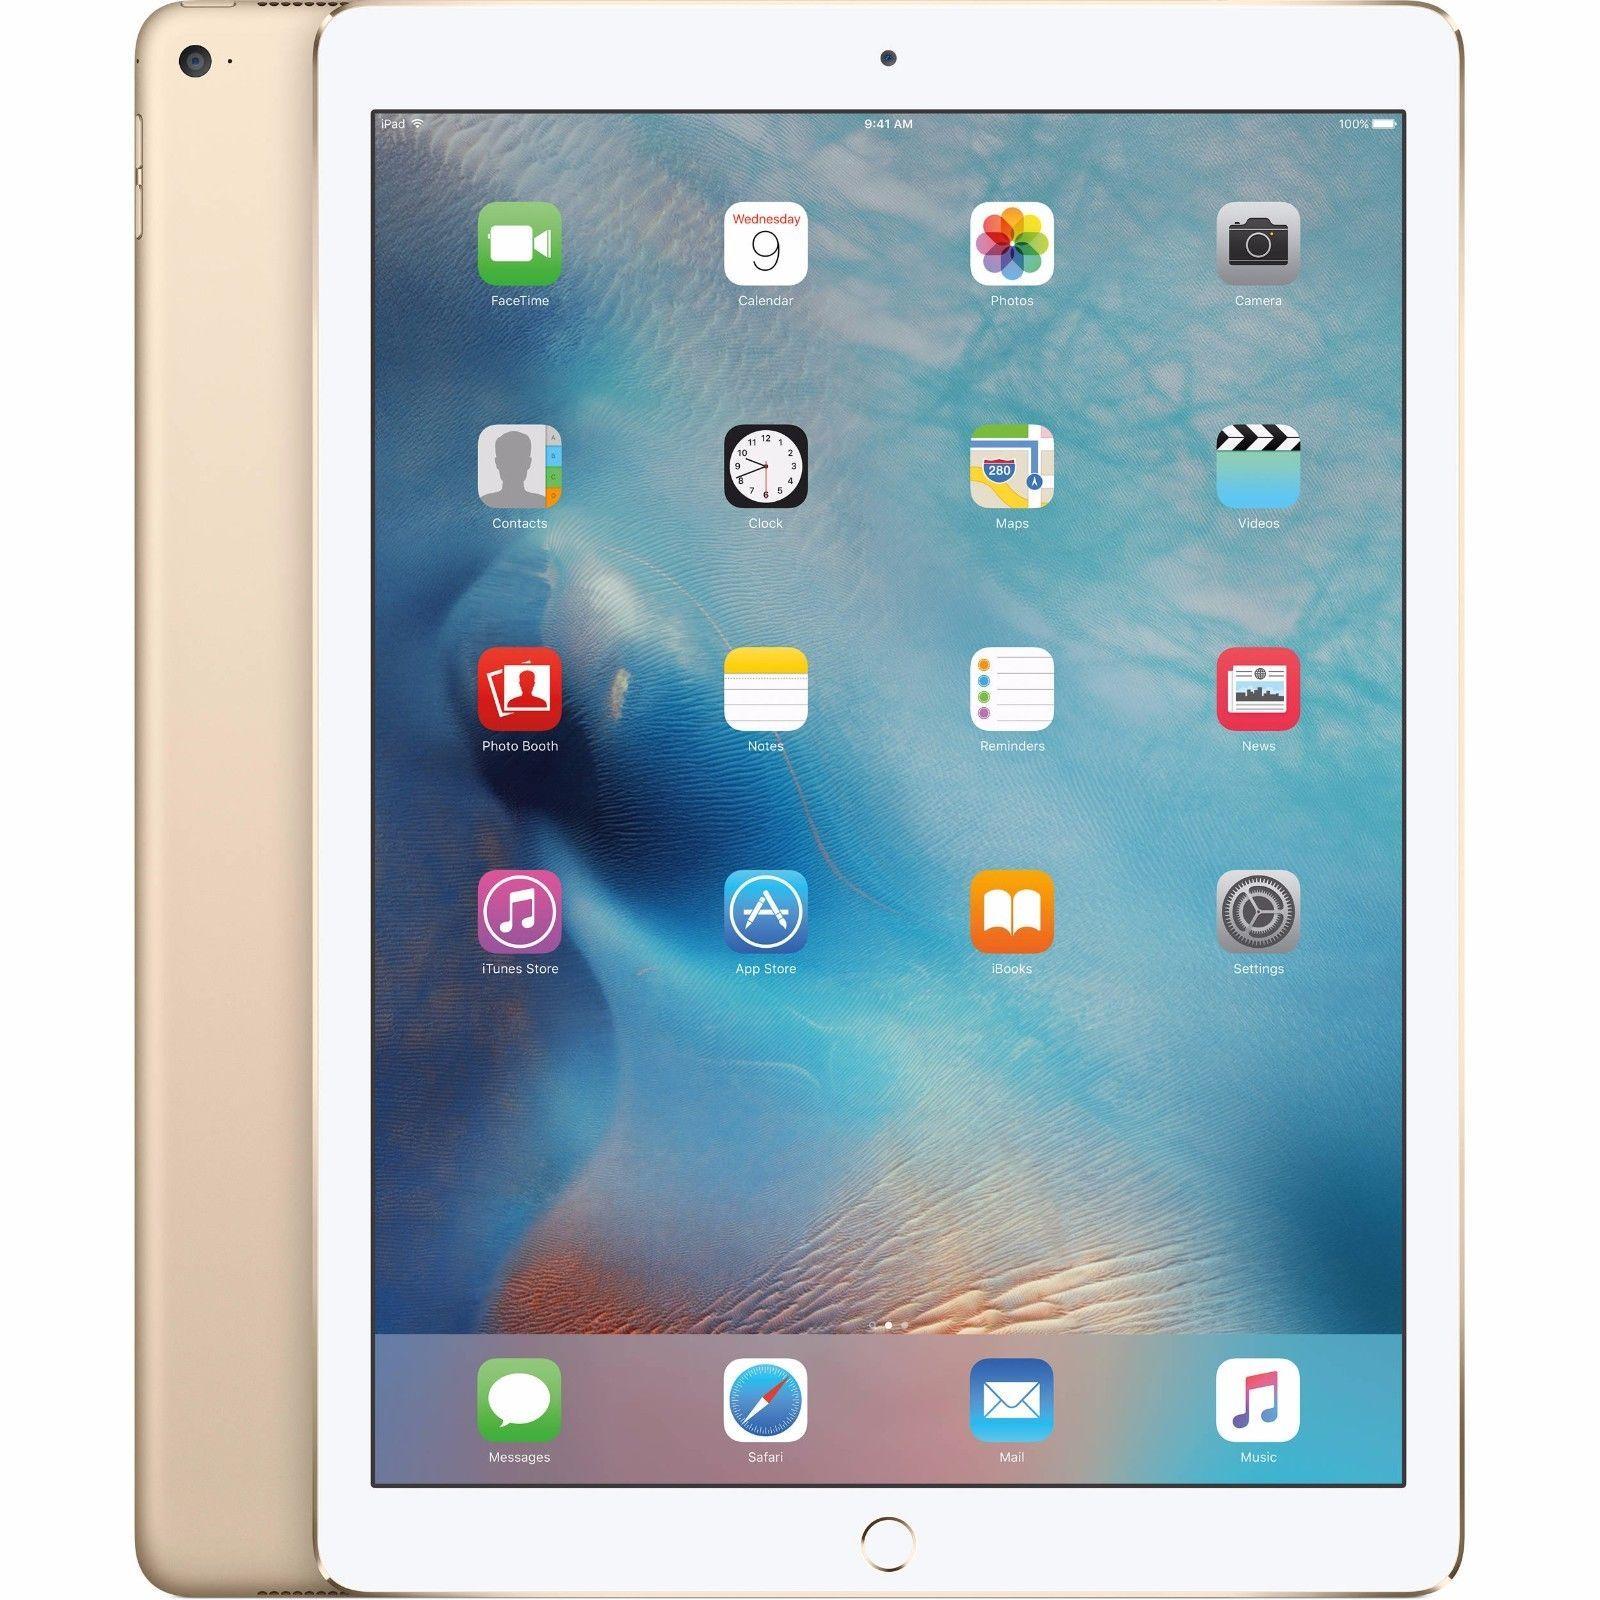 New Apple Ipad Pro 128gb Wi Fi 9 7in Gold Latest Model Sealed Https T Co Umdrlnlu2j Https T Co Tu0w0oxrpz Apple Ipad Mini New Apple Ipad Ipad Mini